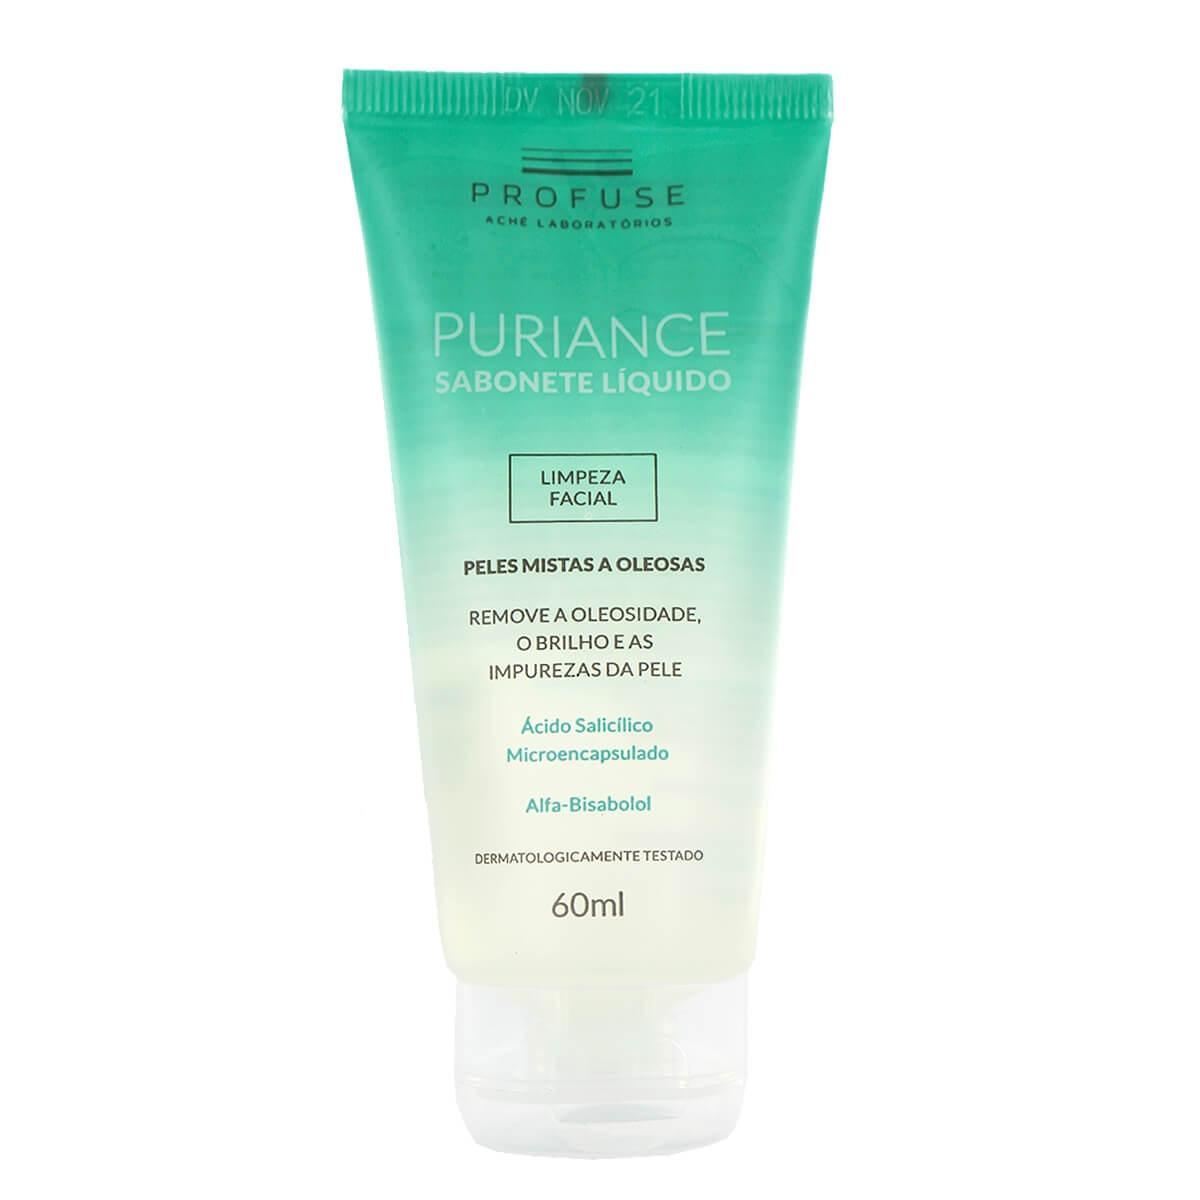 Sabonete Líquido Facial Profuse Puriance Pele Mista a Oleosa com 60ml 60ml